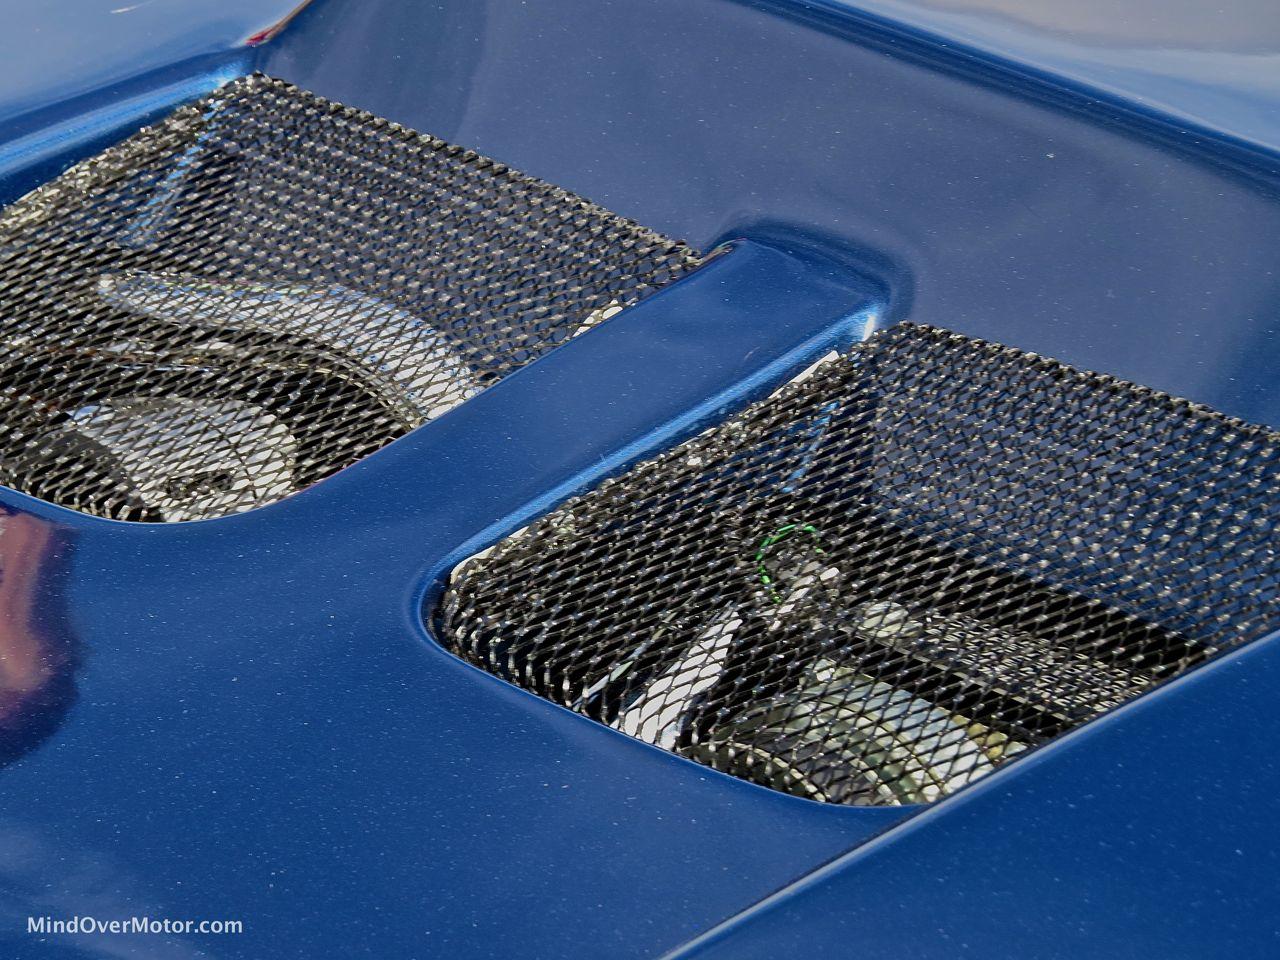 IMSA Mustang Hood Vents